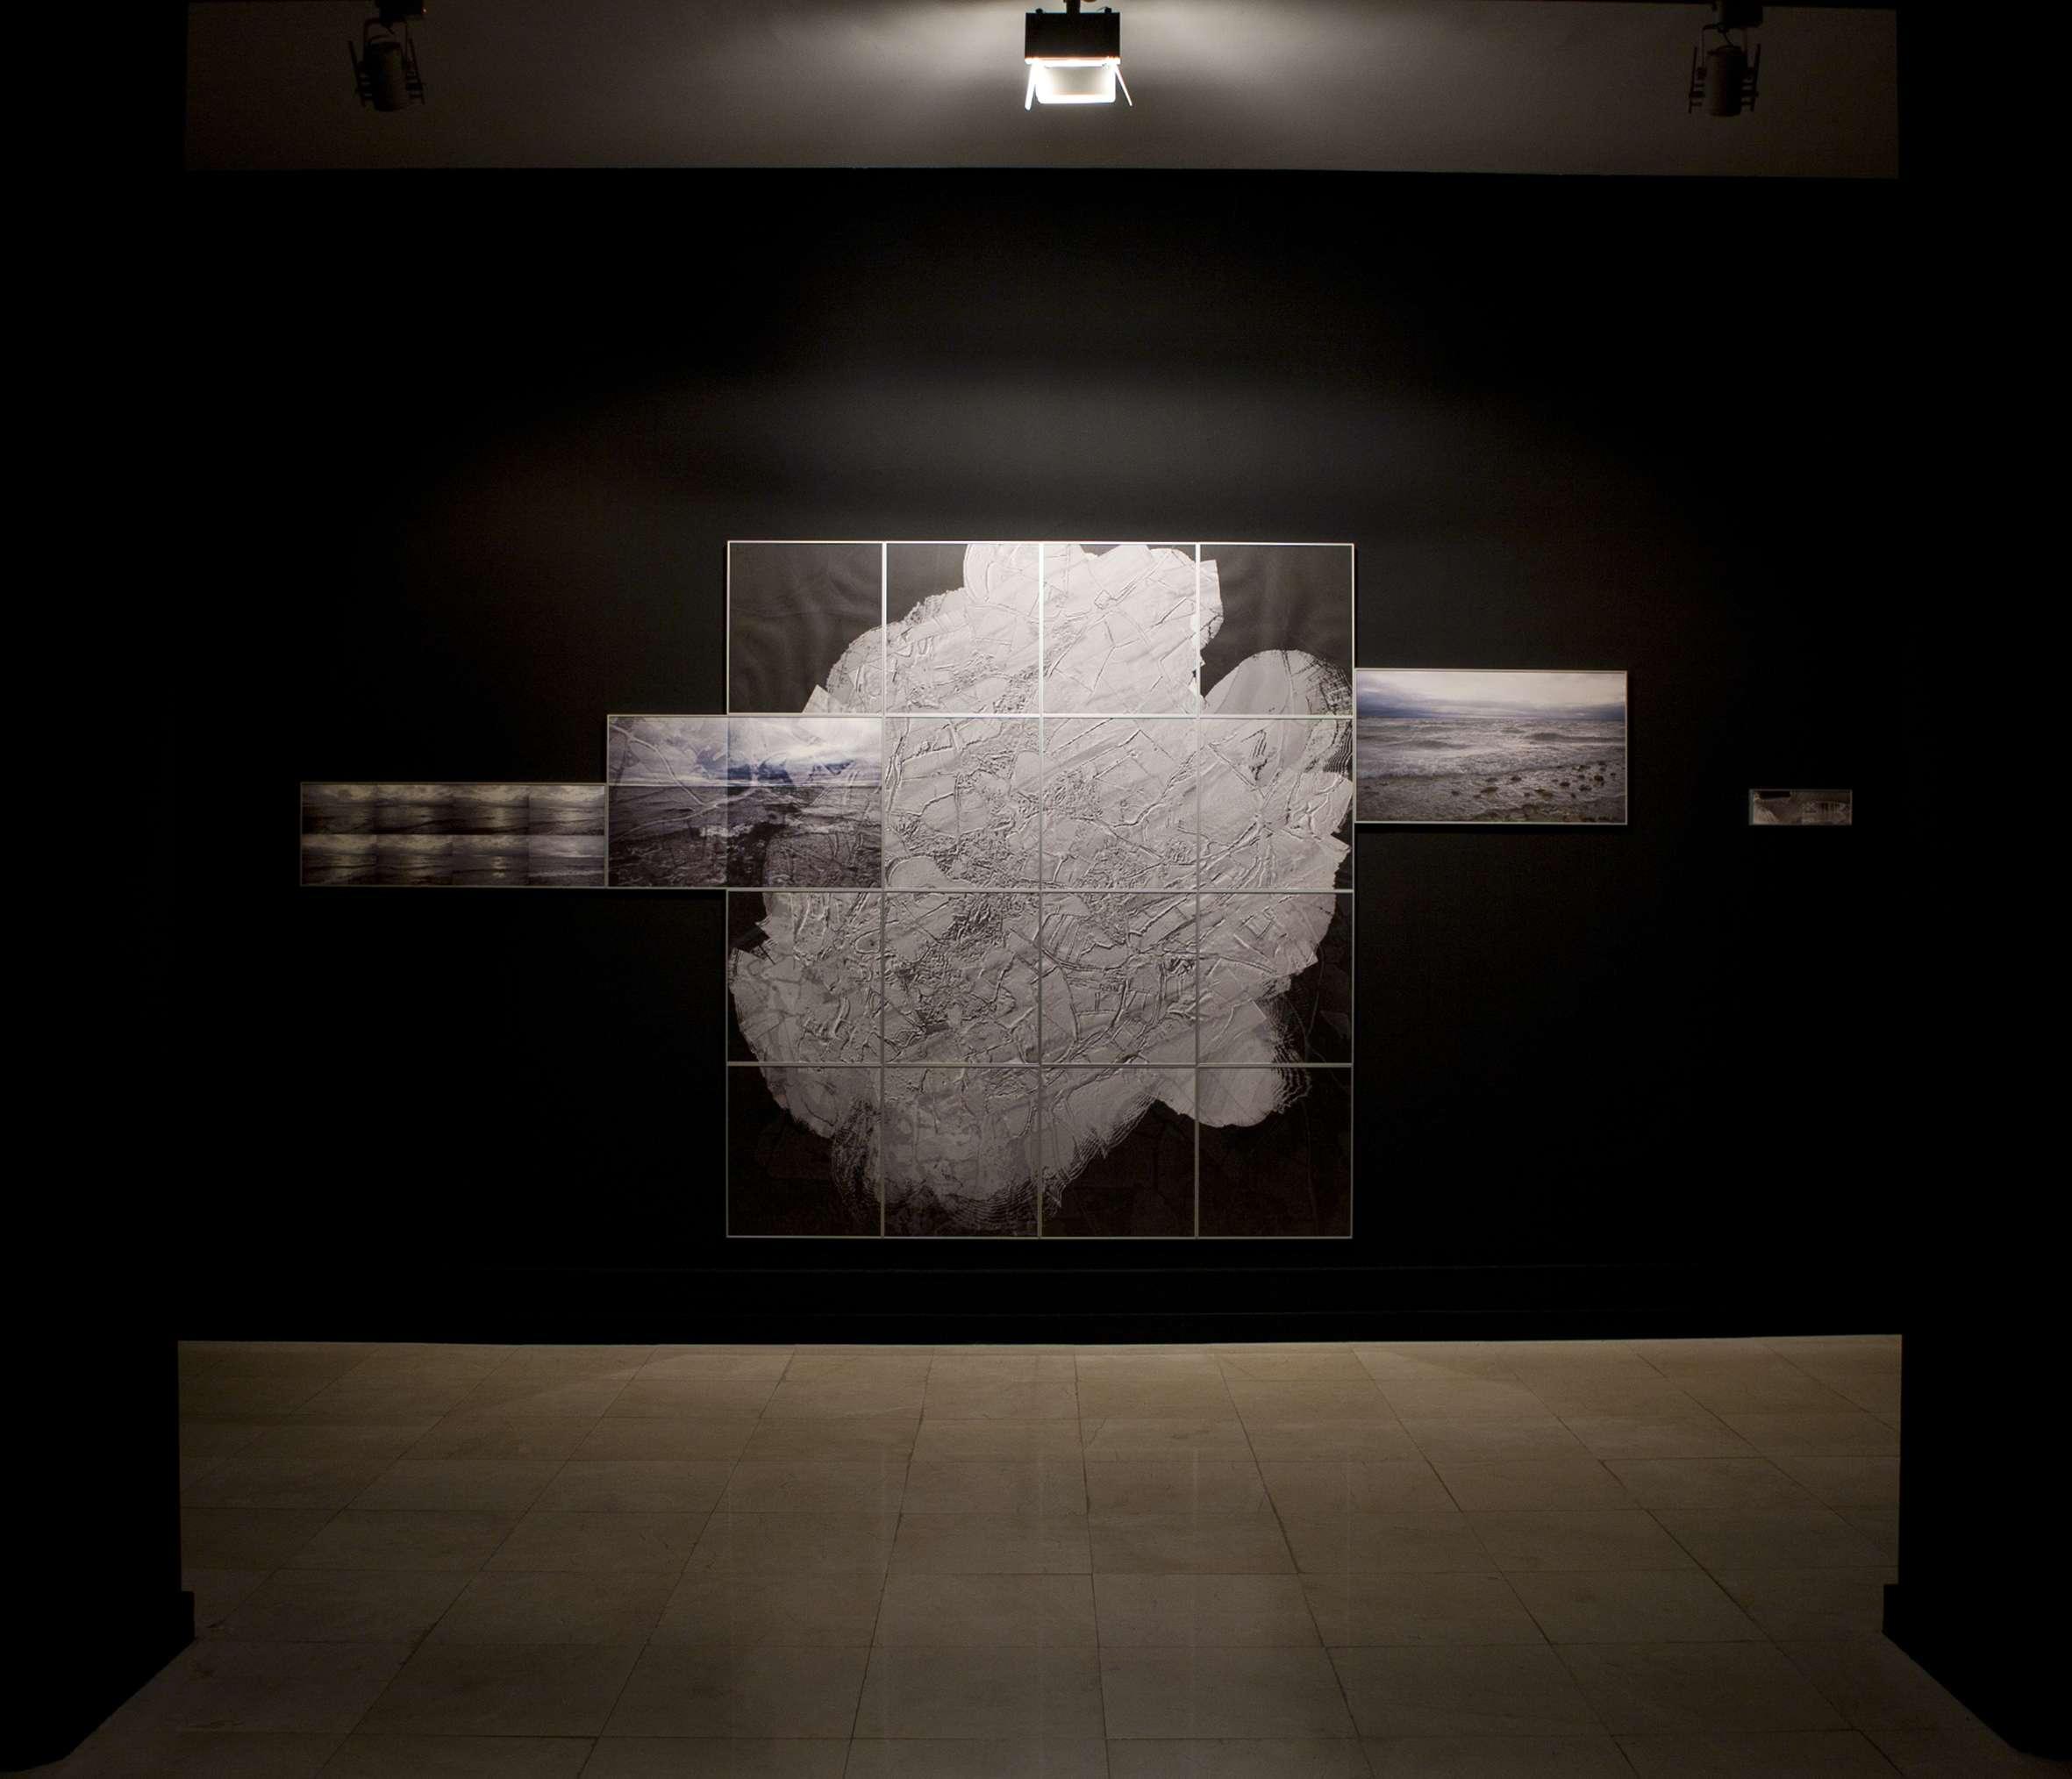 Mapa de un lugar desaparecido (2011) - Bárbara Fluxá